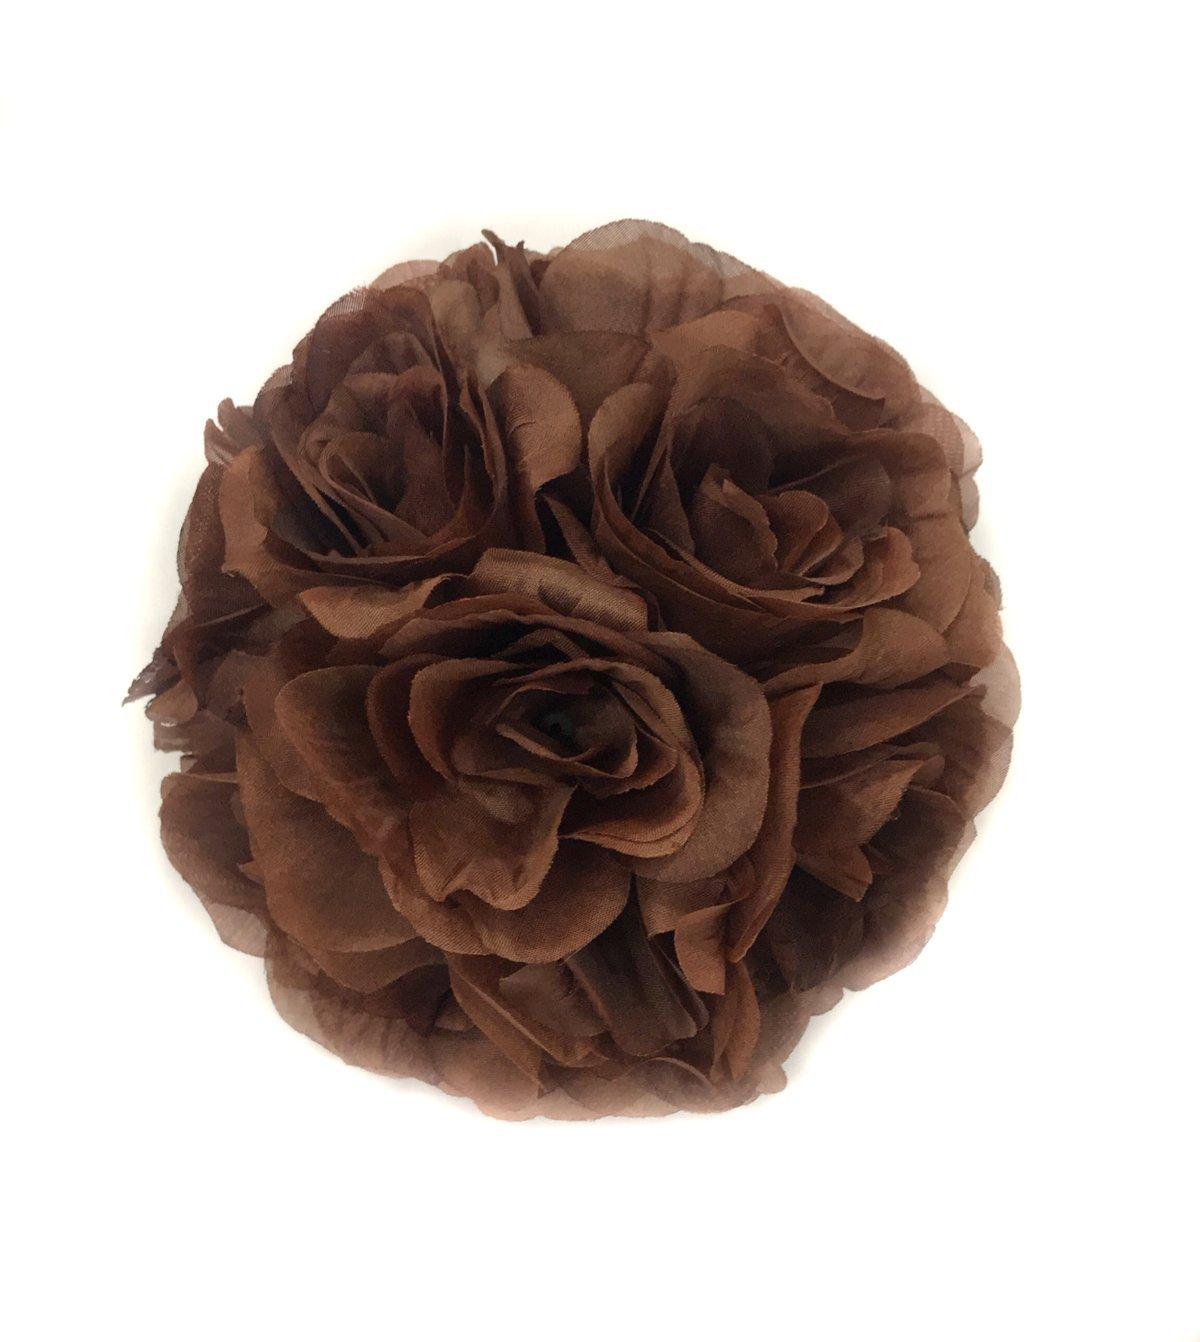 (25cm, Ivory) - Ben Collection Fabric Artificial Flowers Silk Rose Pomander Wedding Party Home Decoration Kissing Ball Trendy Colour Simulation Flower (Ivory, 25cm) B076XW7N4M 25cm|アイボリー アイボリー 25cm